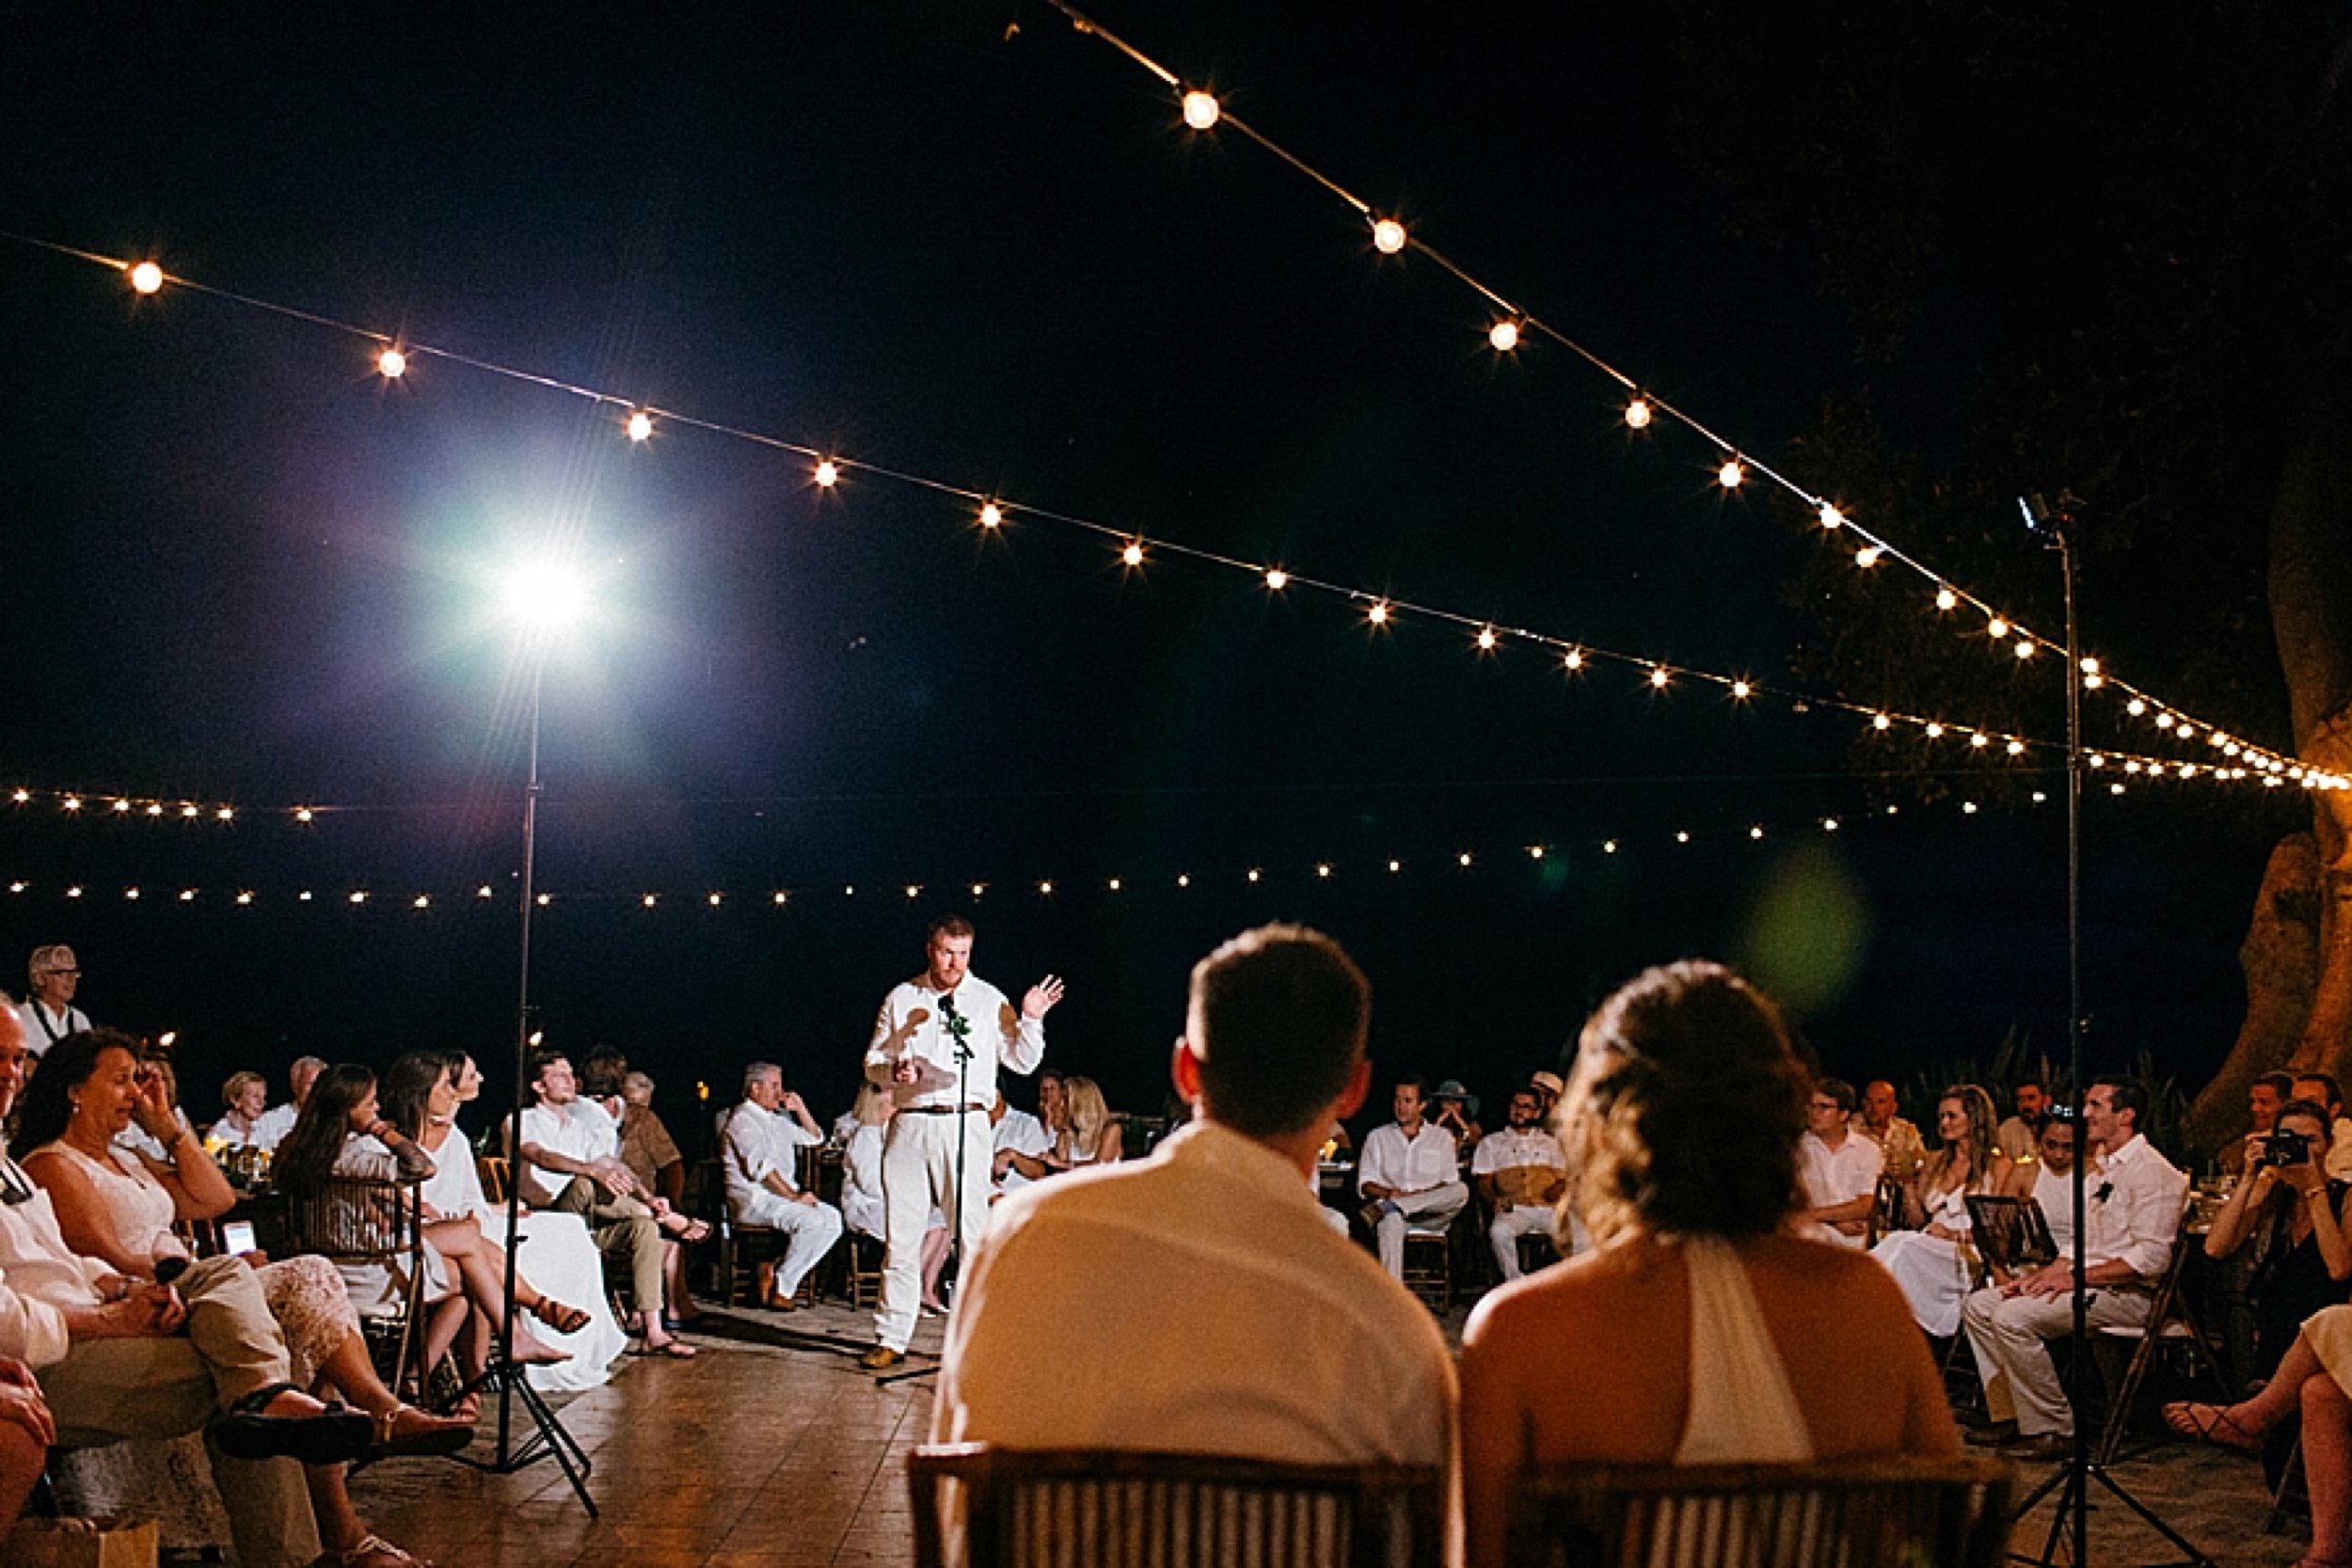 maui-wedding-at-olowalu-plantation-house_0113.jpg